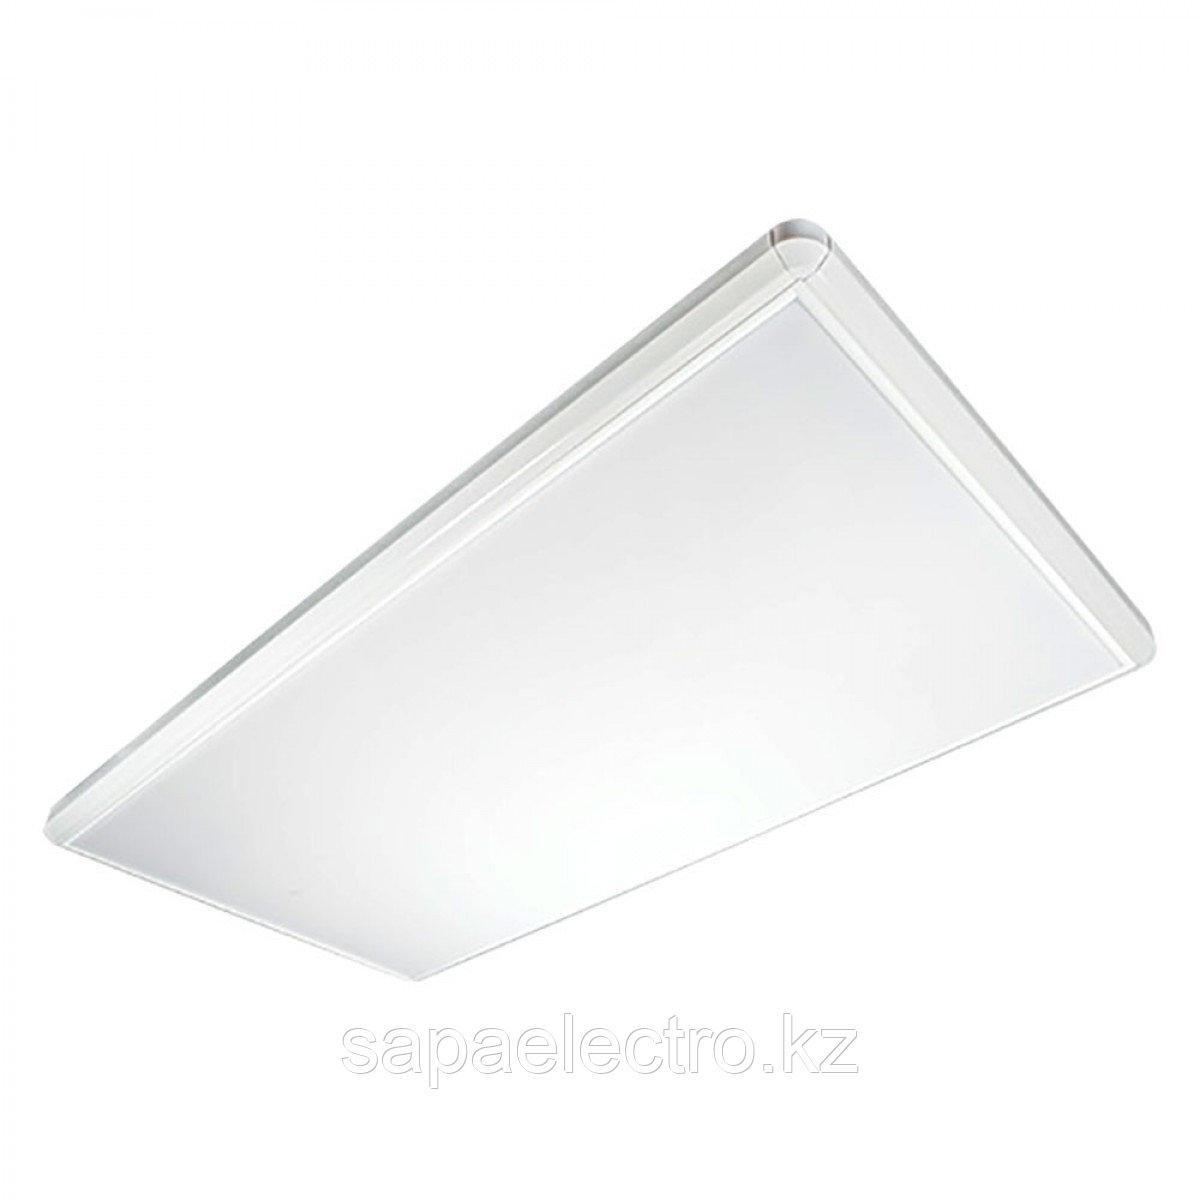 Св-к LZN 4X36W S/U OPAL DETAY  MEGALUX ELECTR (TS)